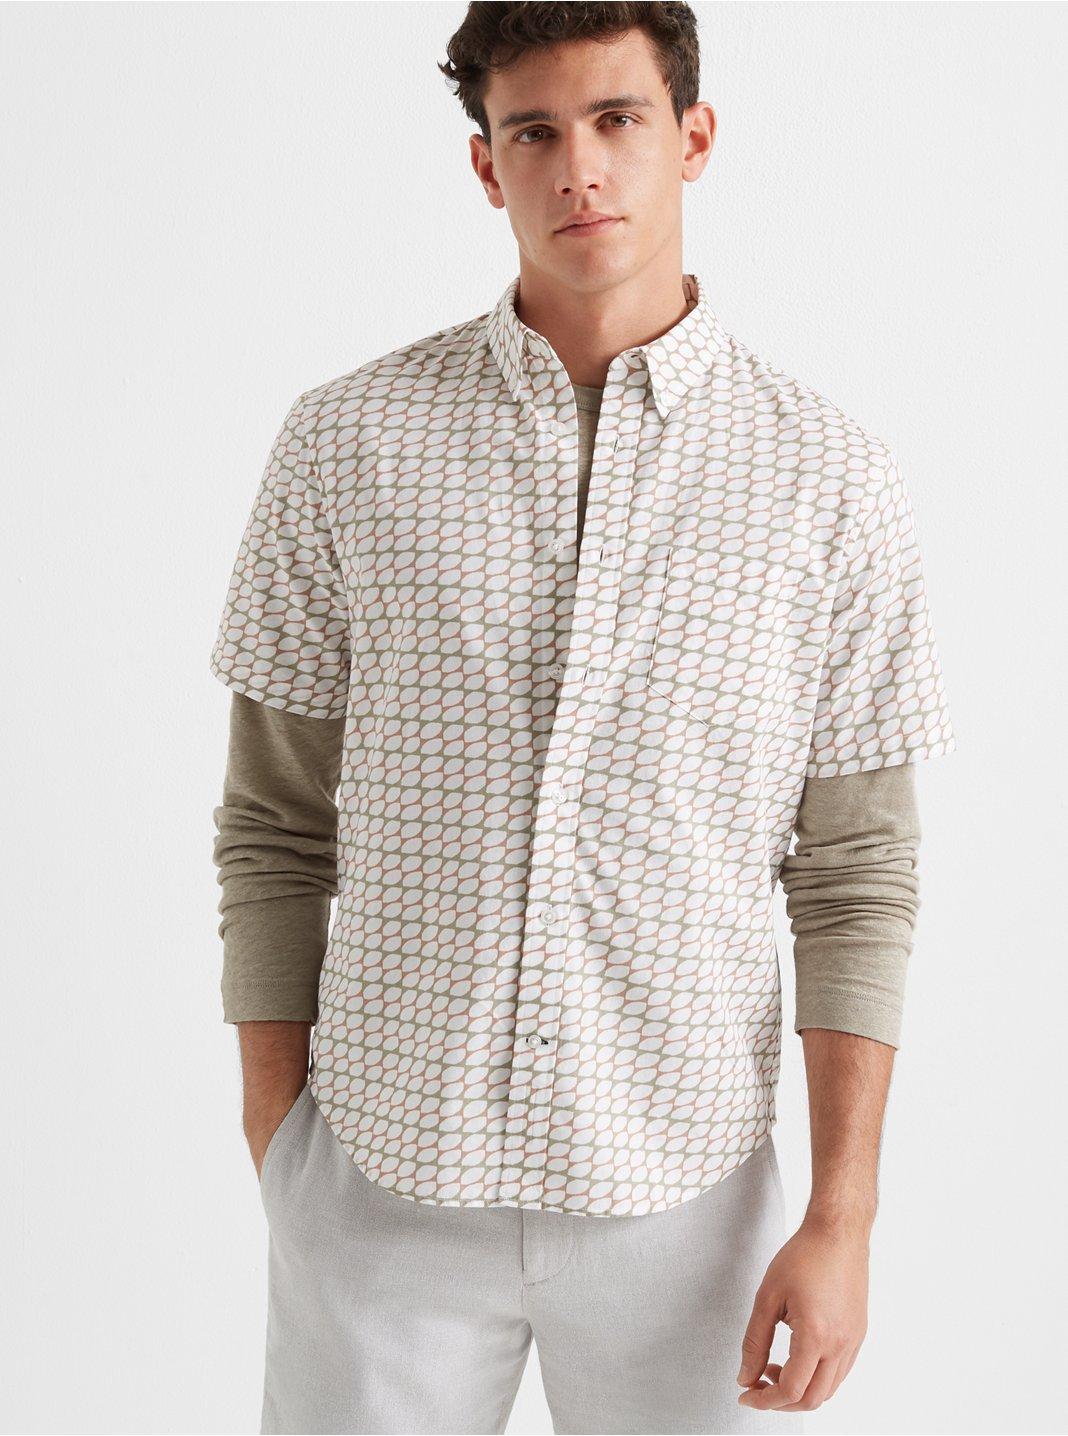 Short Sleeve Geometric Shirt